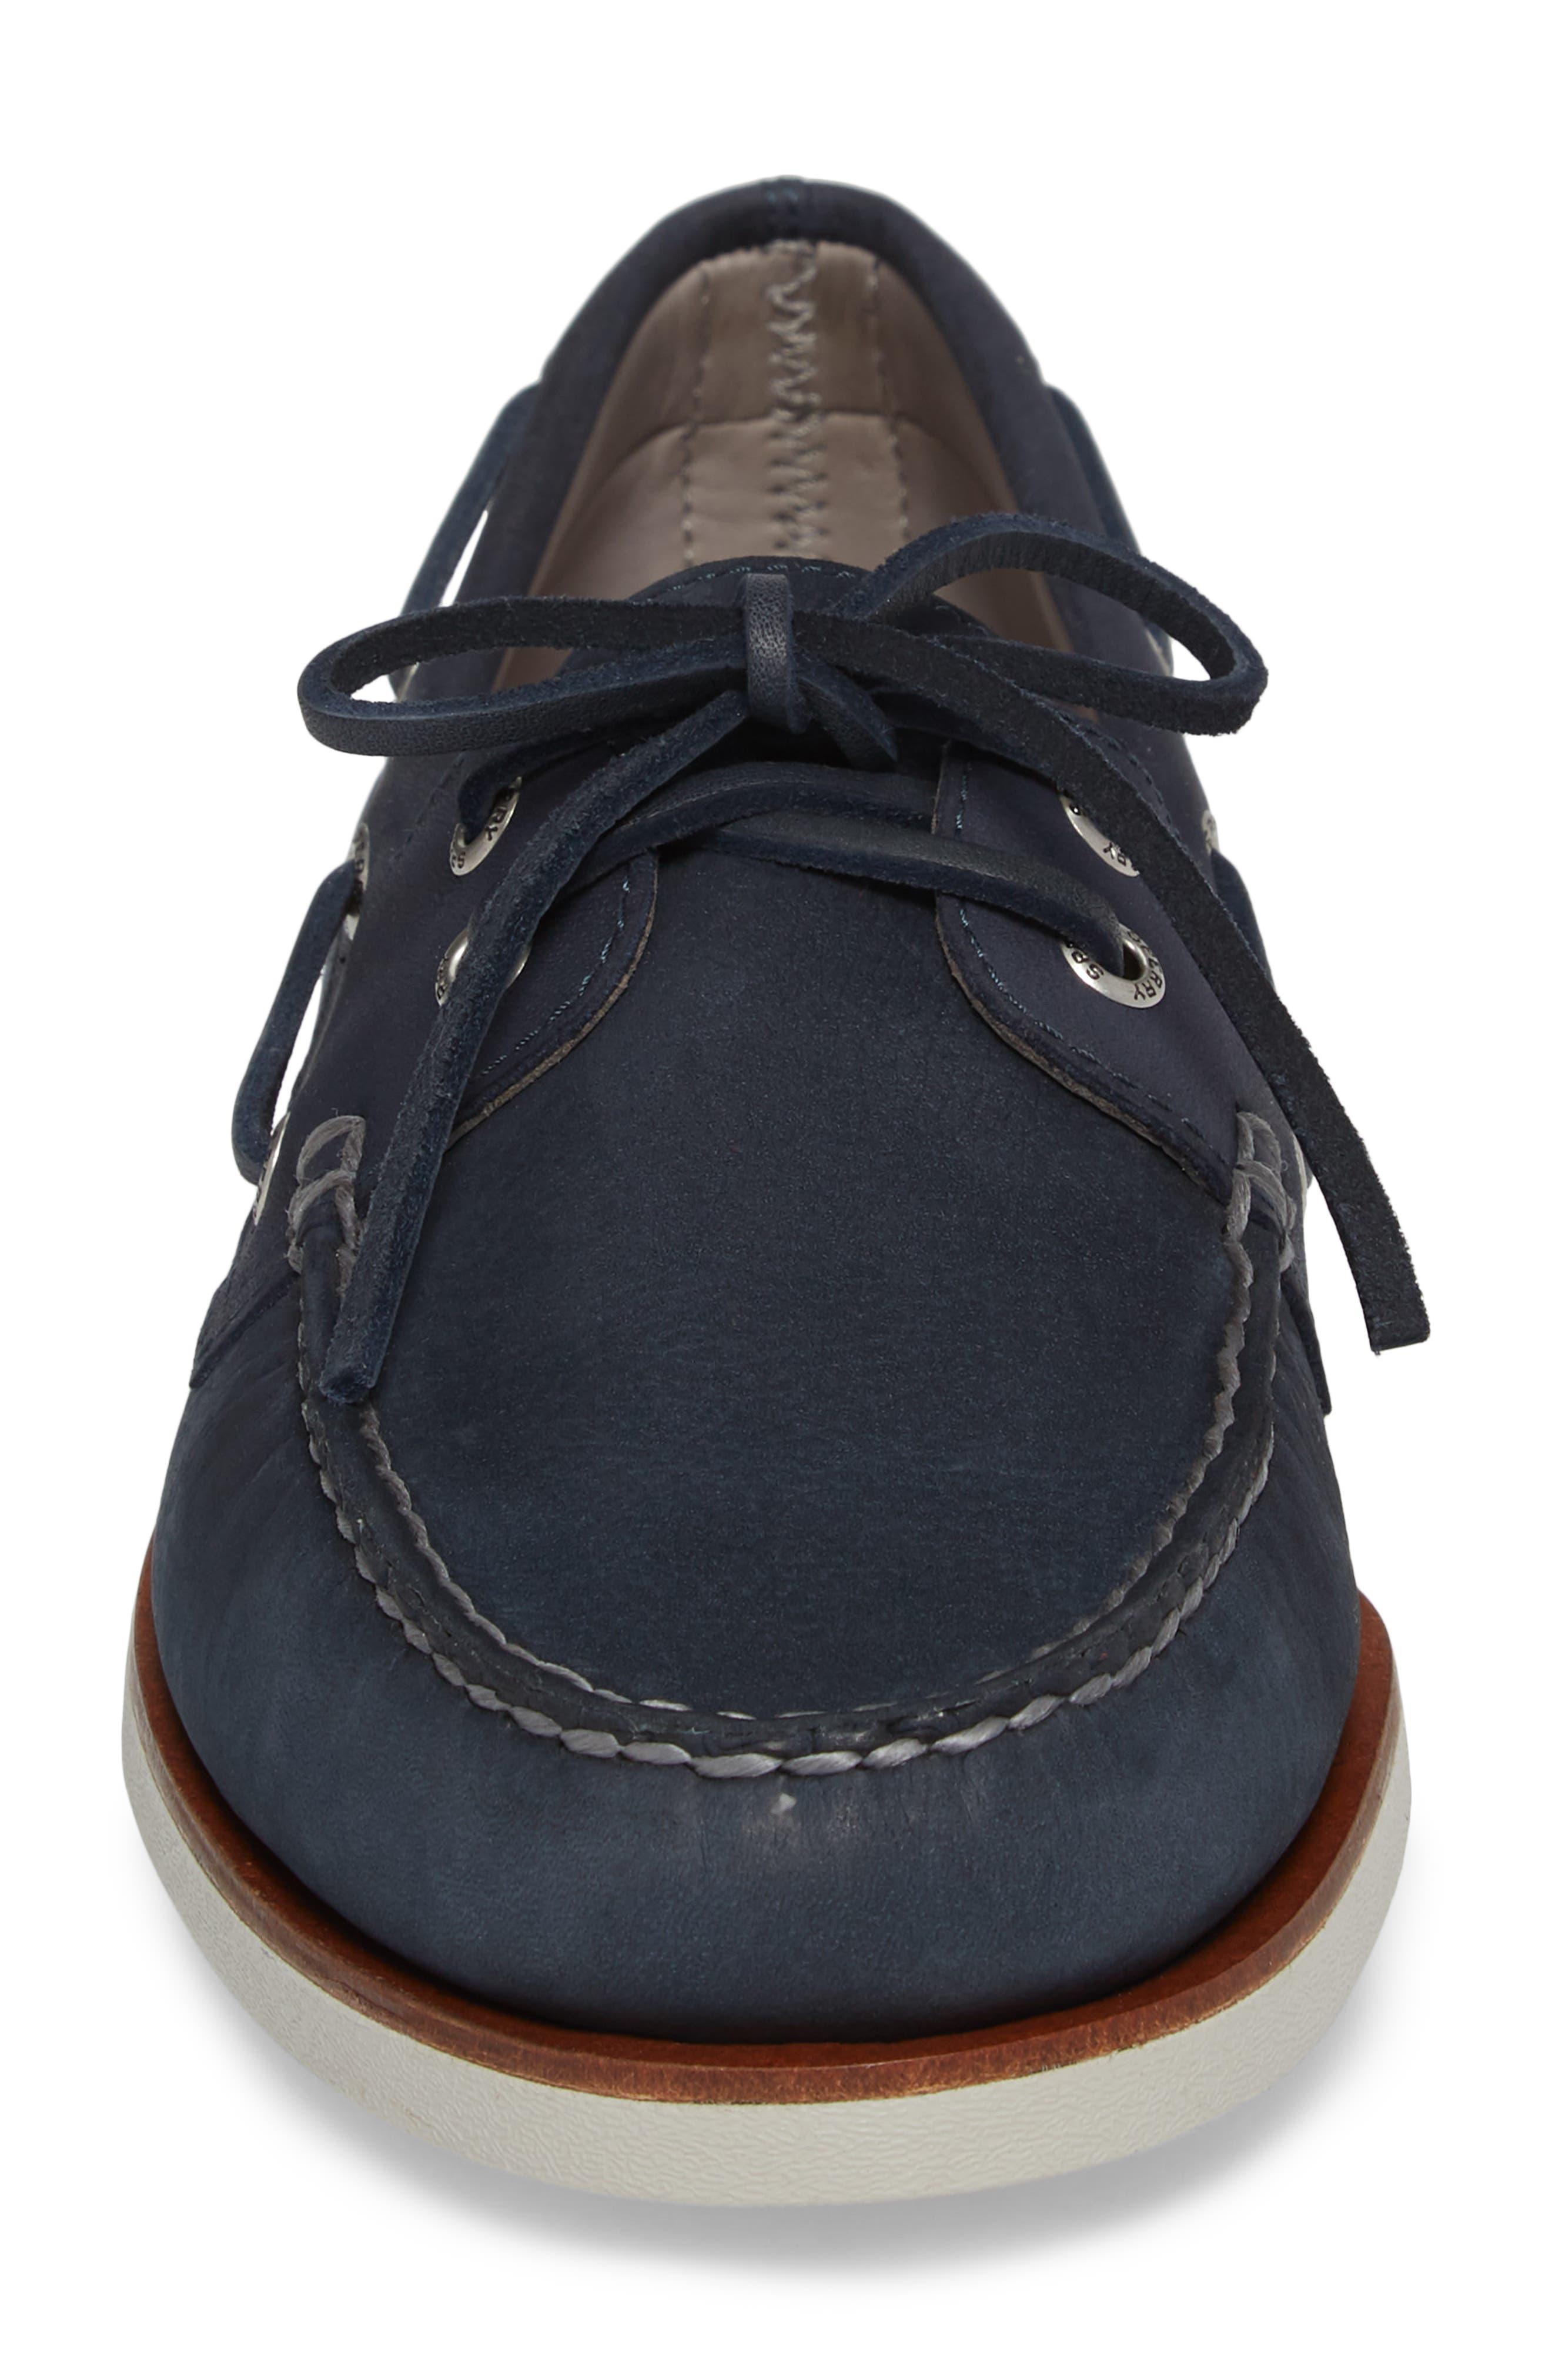 'Gold Cup - Authentic Original' Boat Shoe,                             Alternate thumbnail 3, color,                             Blue/ Navy Leather